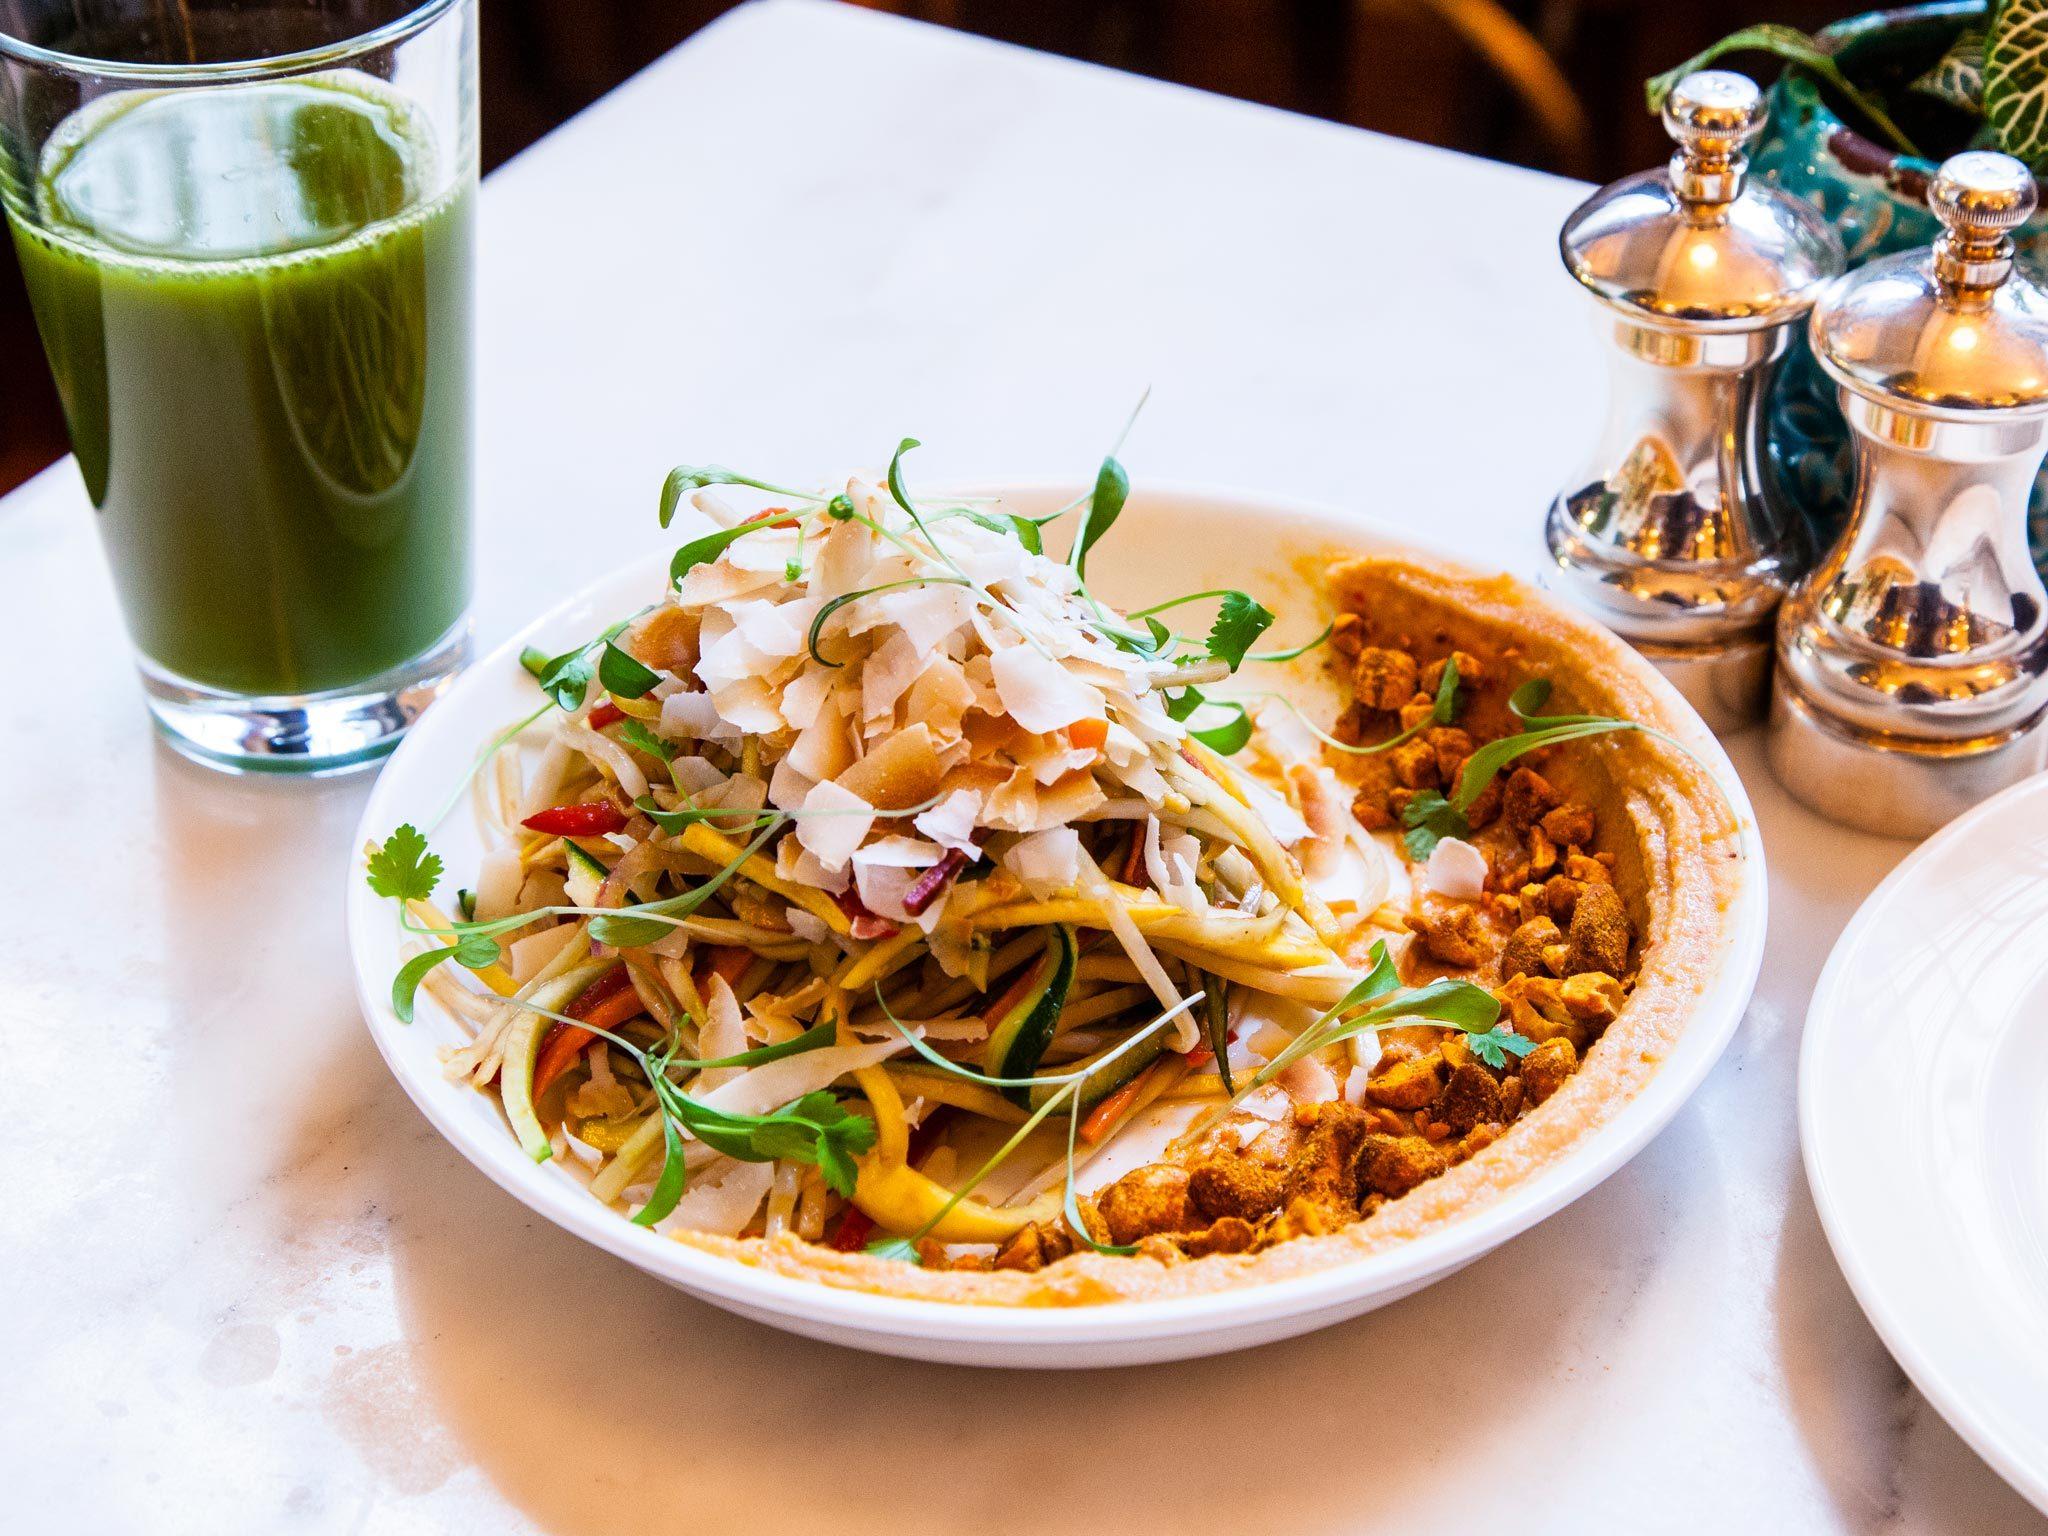 top 100 dishes - malibu kitchen - young coconut salad